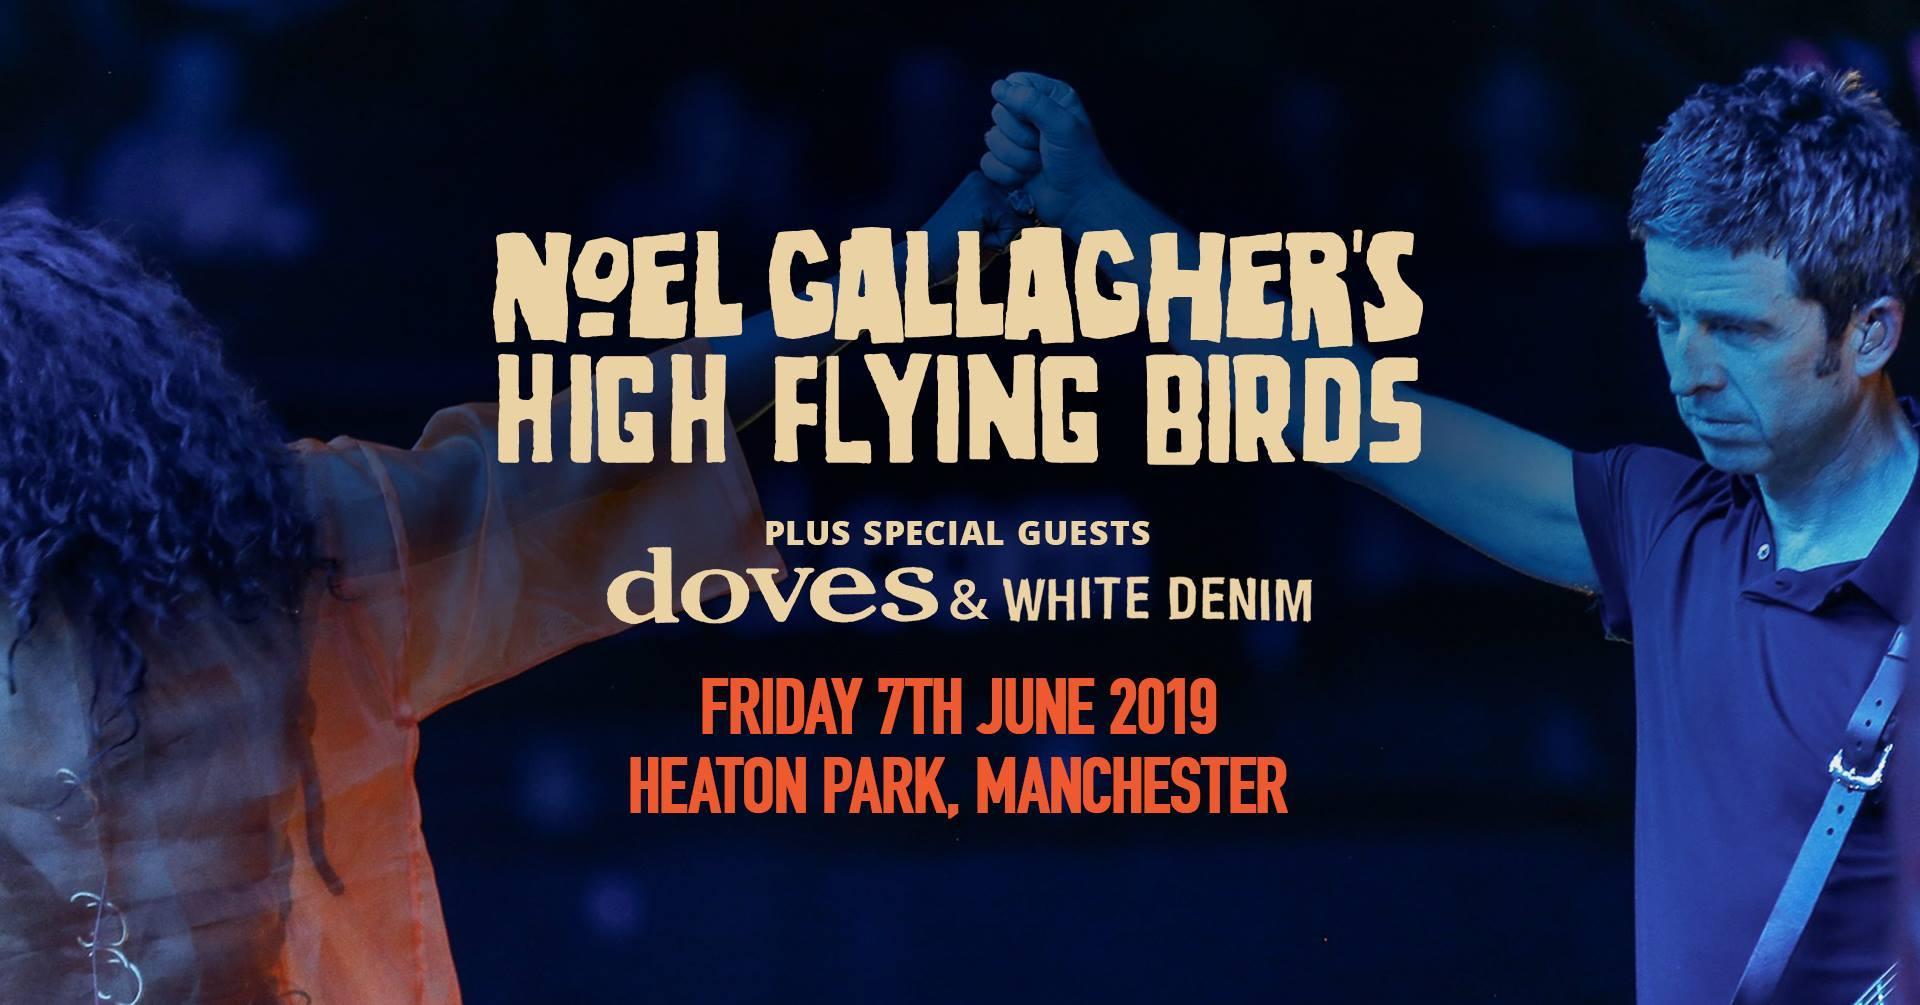 Noel Gallaghers High Flying Birds Tickets Heaton Park Manchester